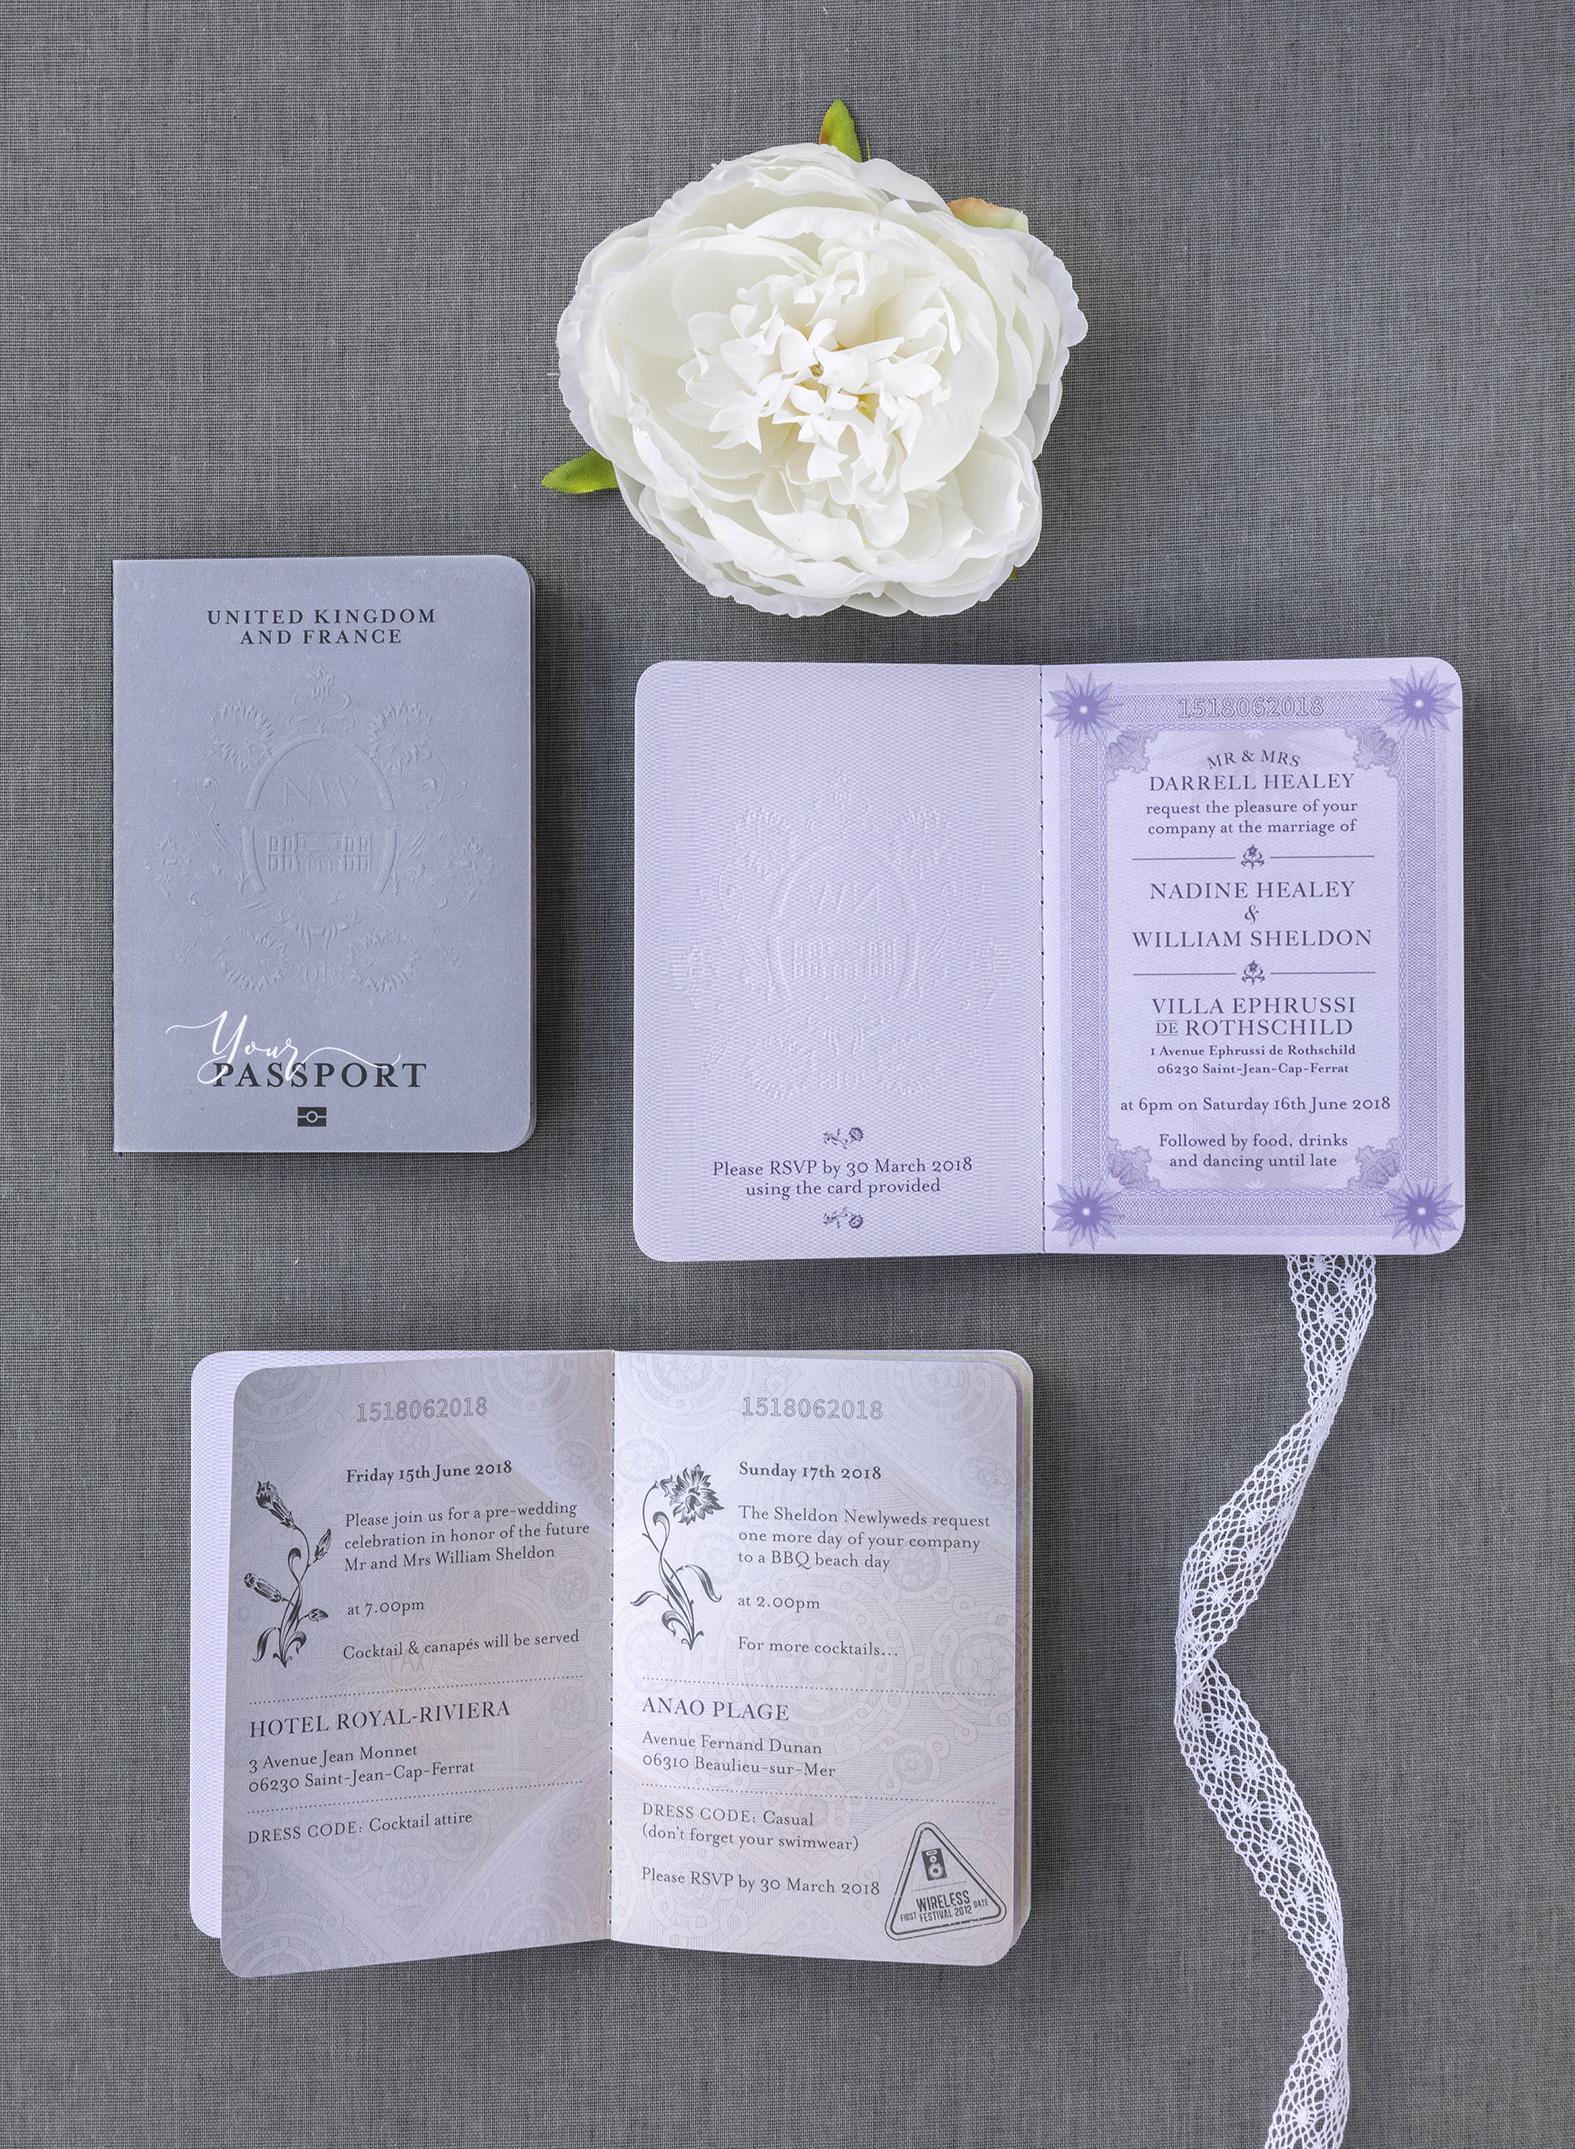 Louise Richardson Passport Invitation.jpg